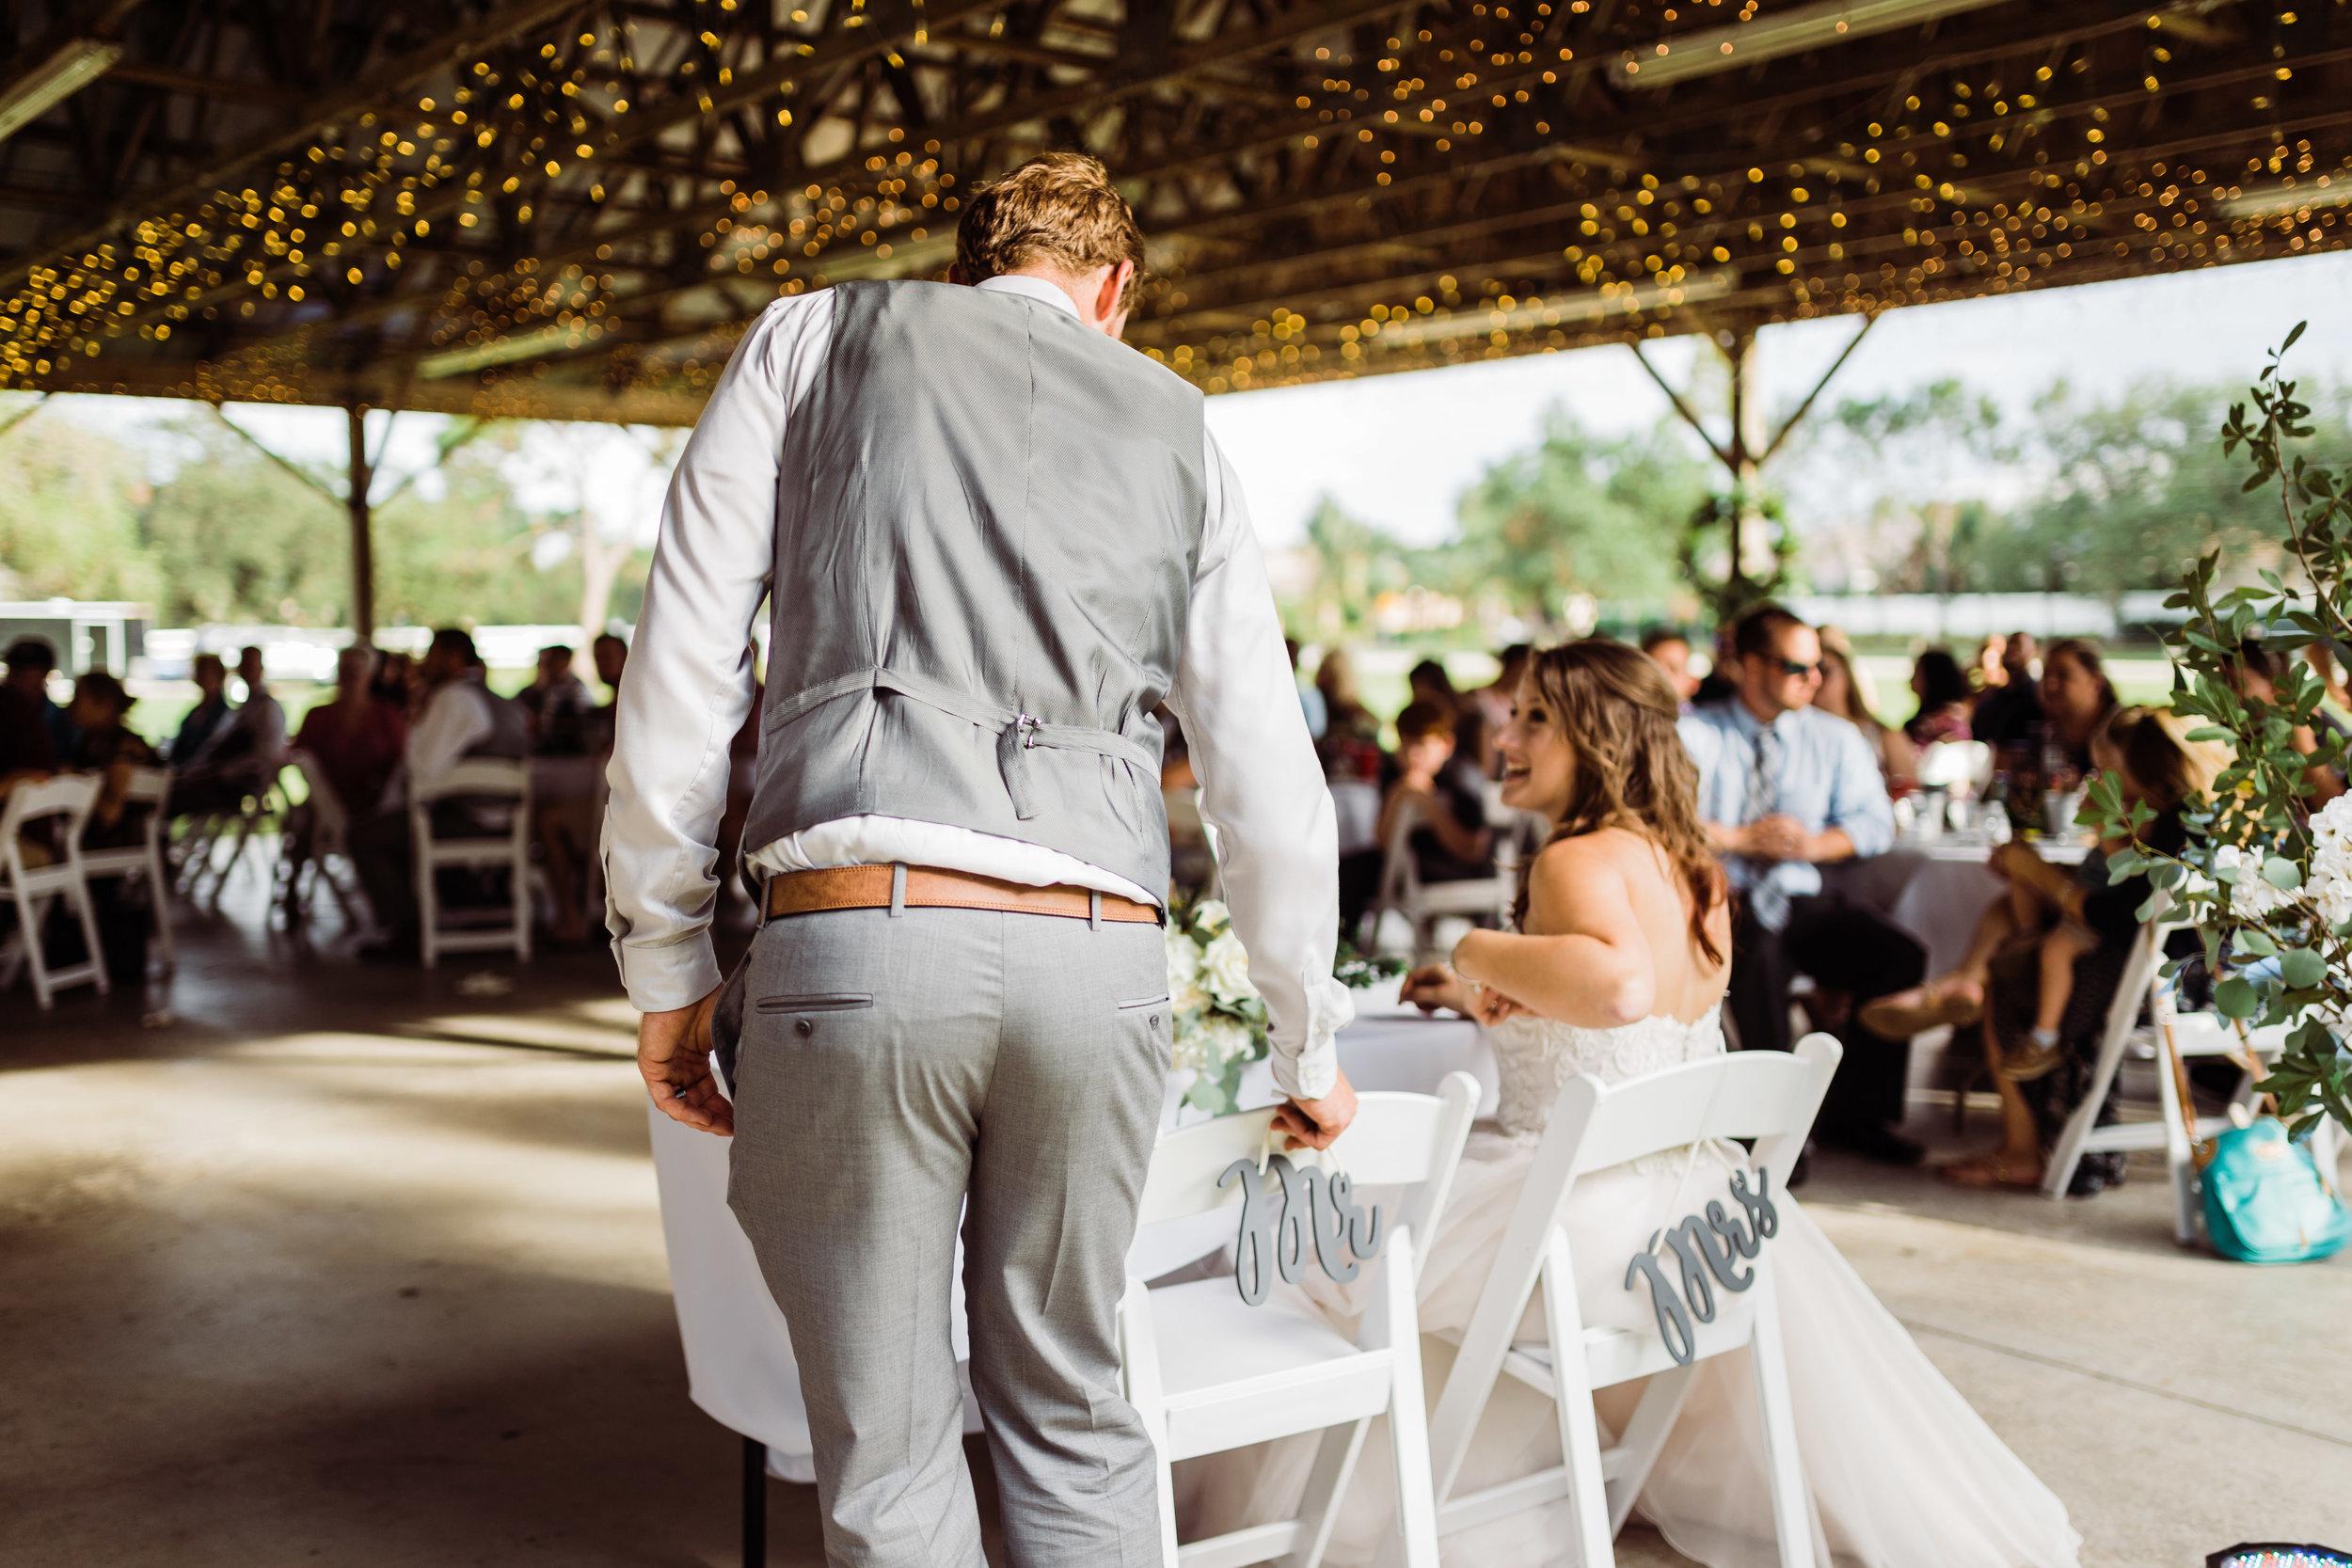 2017.10.14 Samantha and Matthew Crabtree Sarasota Wedding (483 of 708).jpg